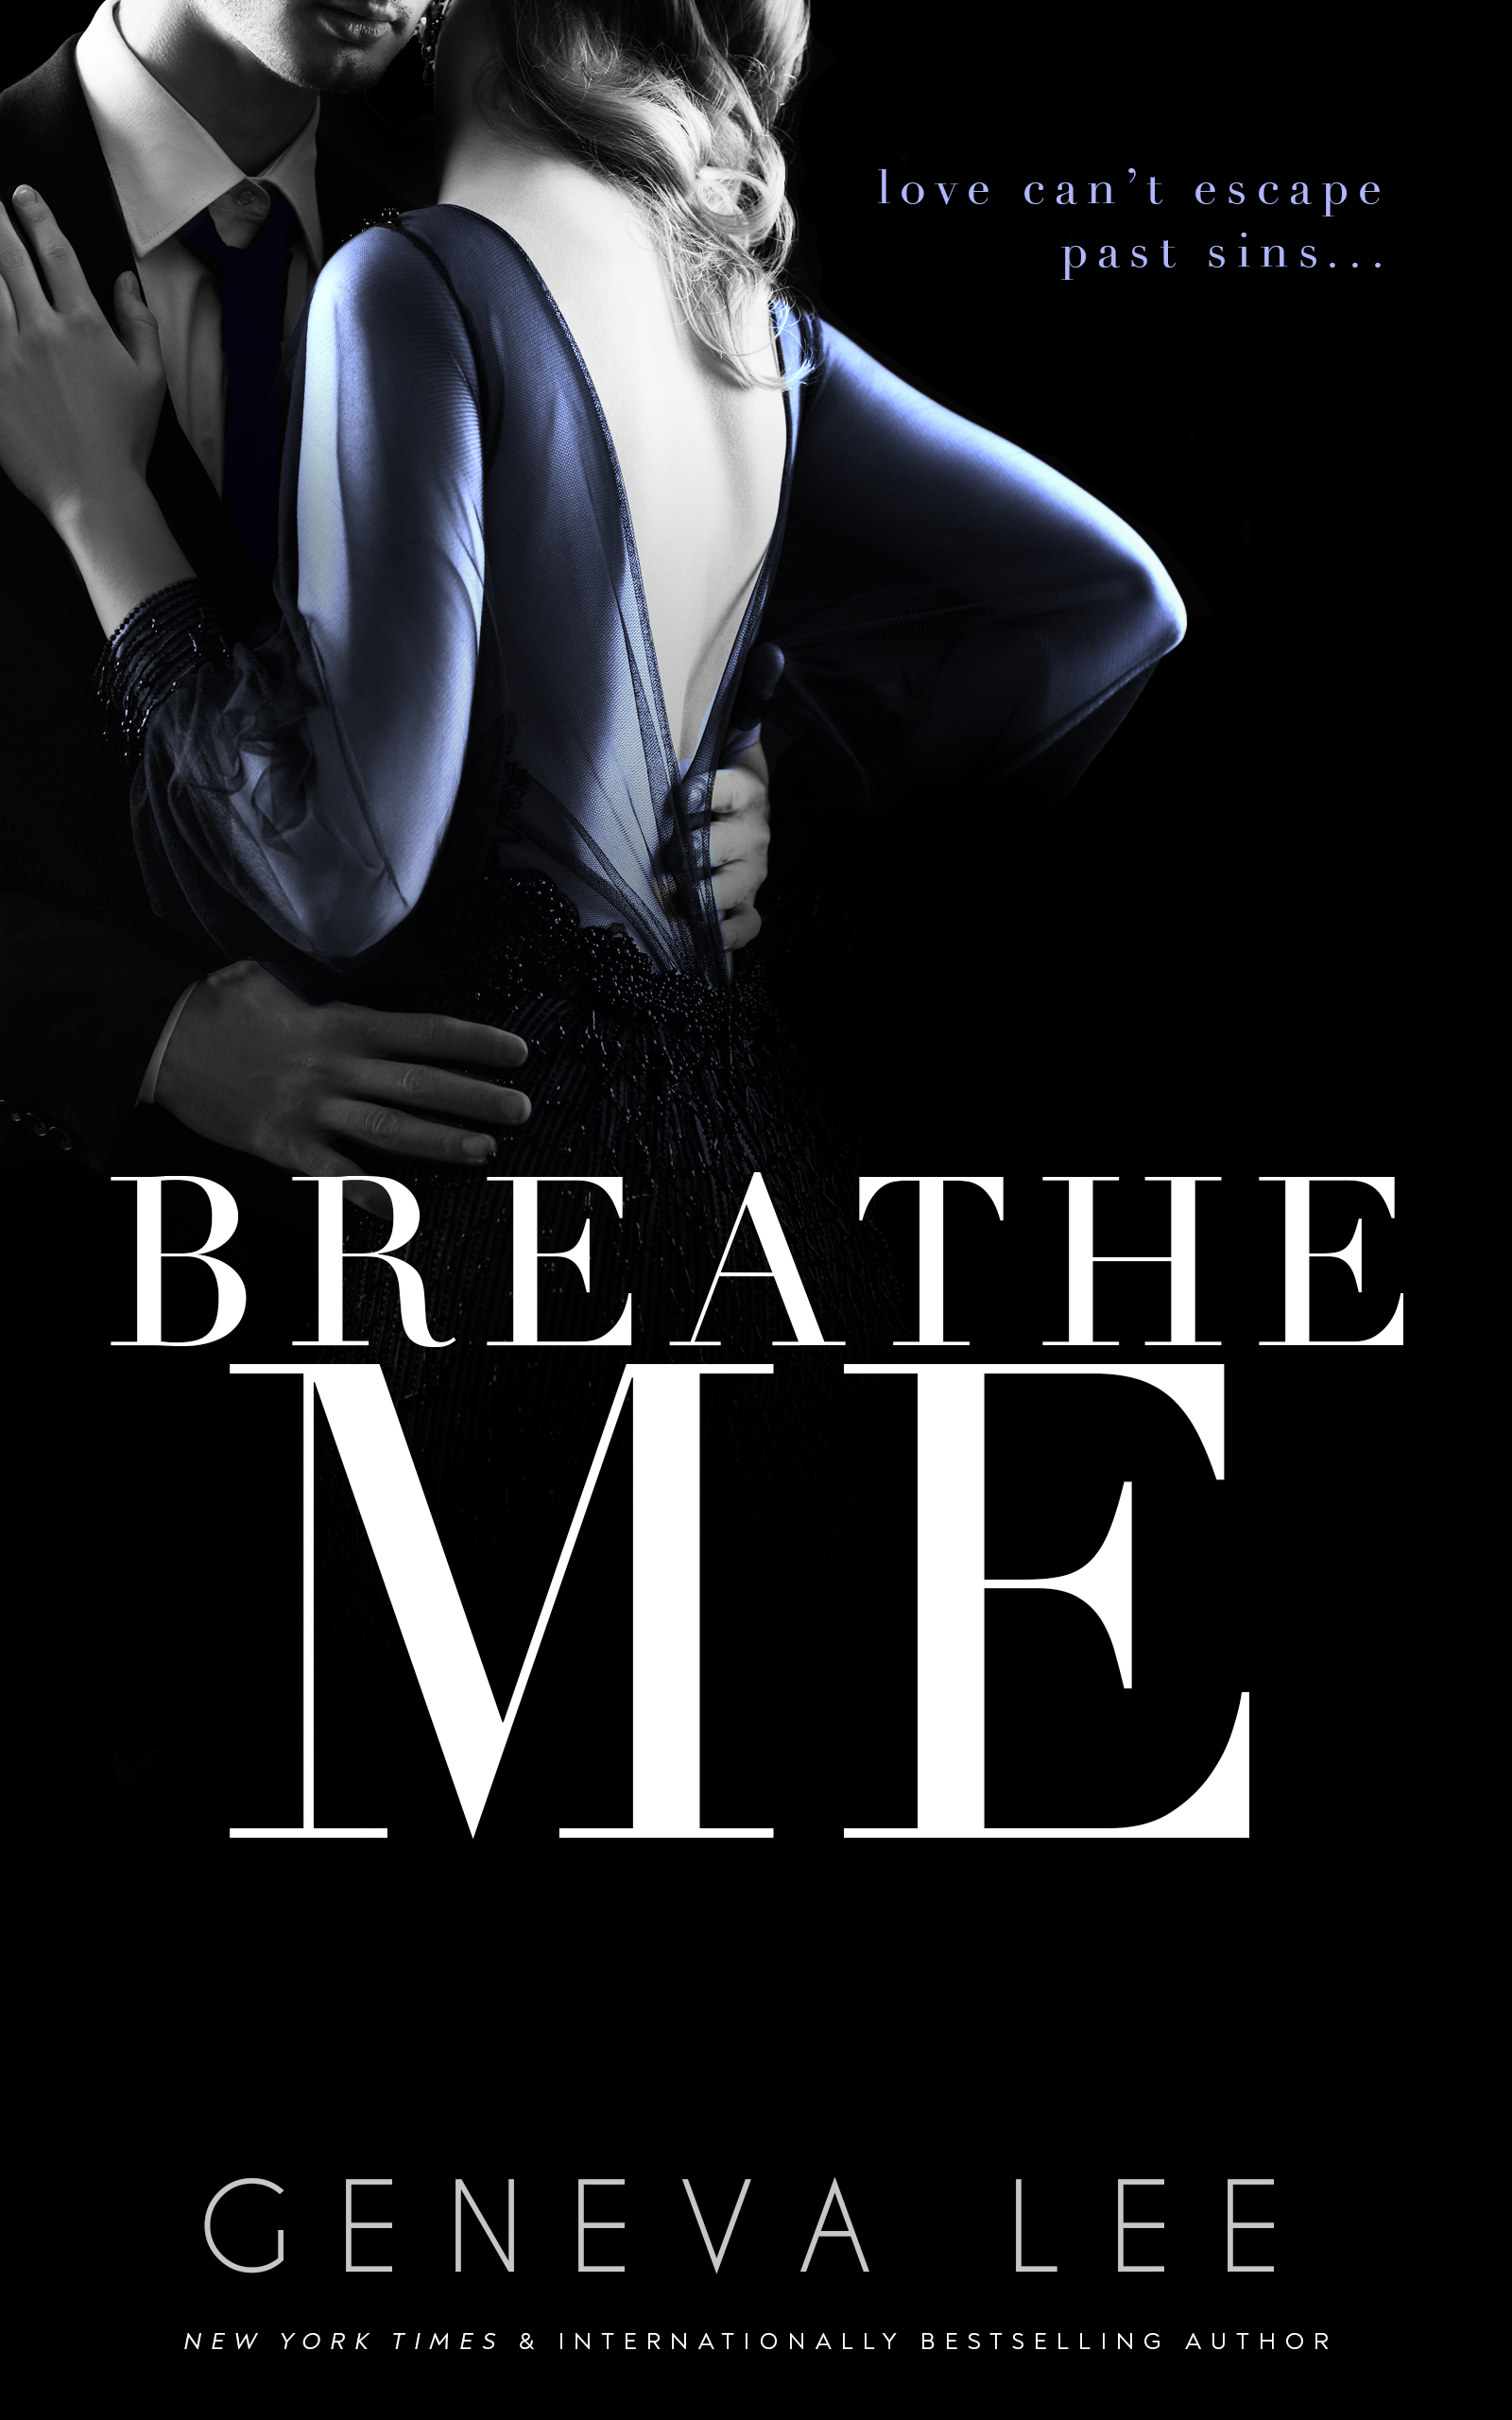 breatheme